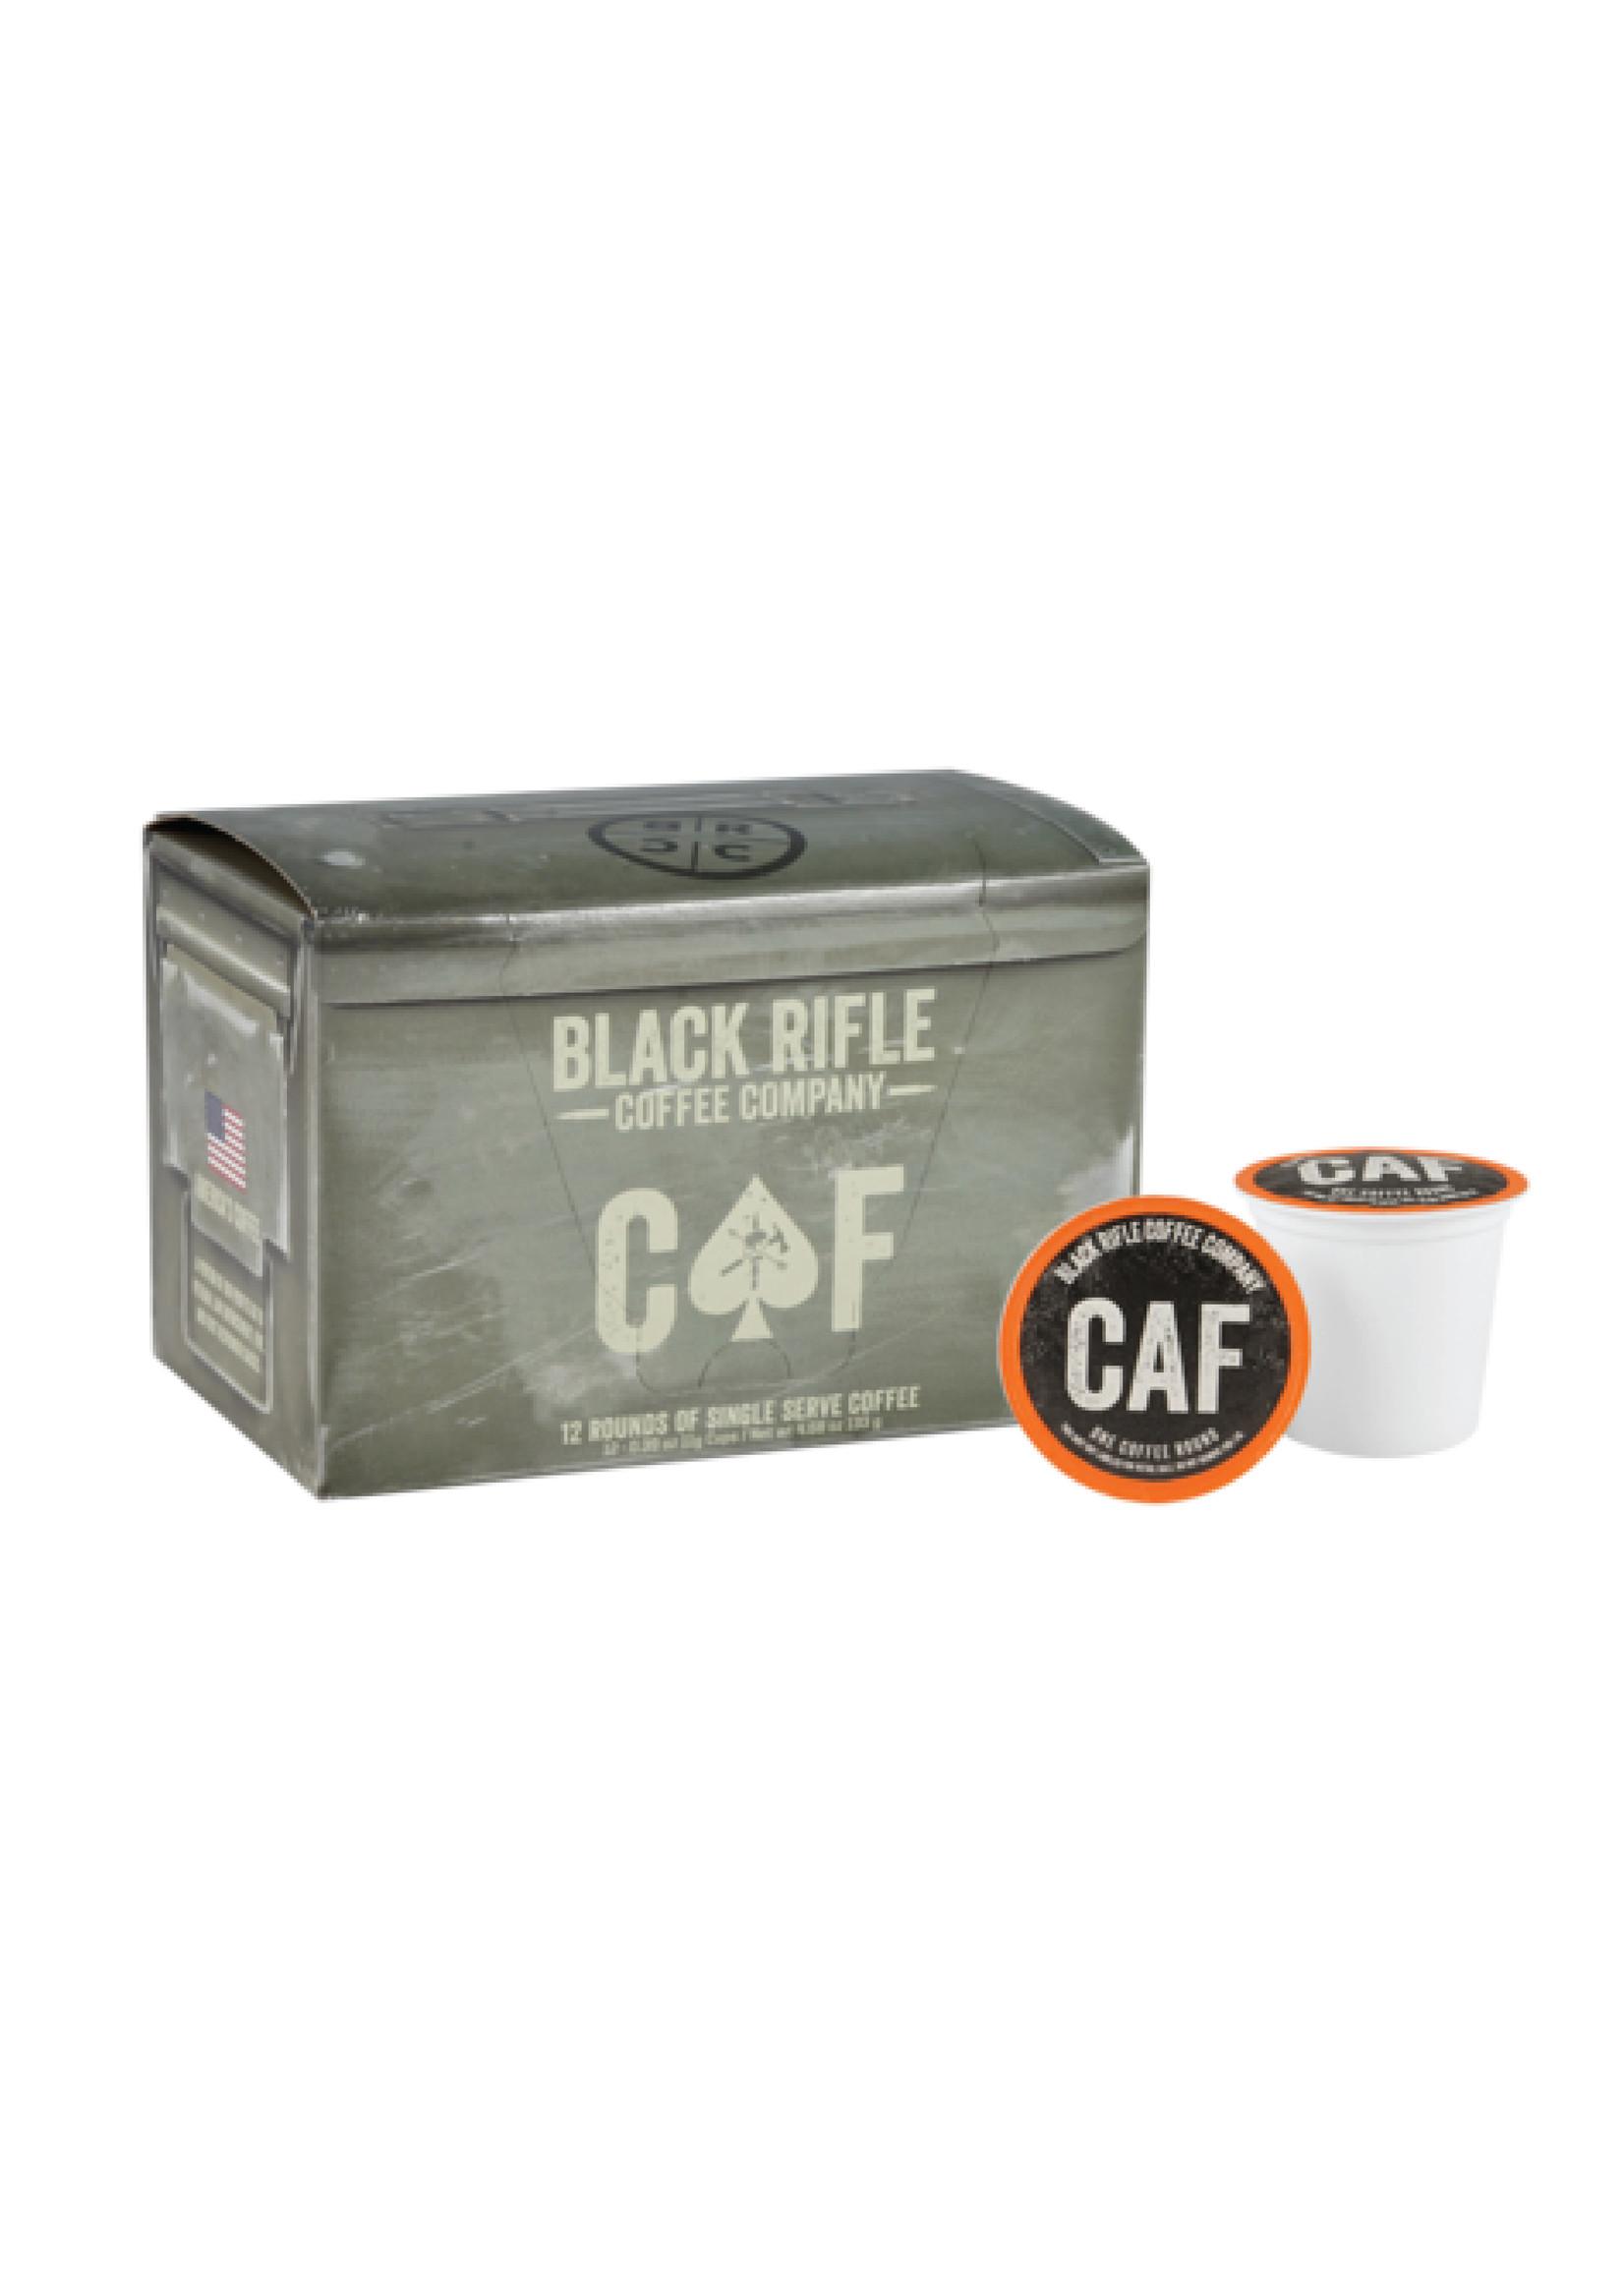 Black Rifle Coffee Company Black Rifle Coffee Company Just Decaf Coffee Rounds 12ct